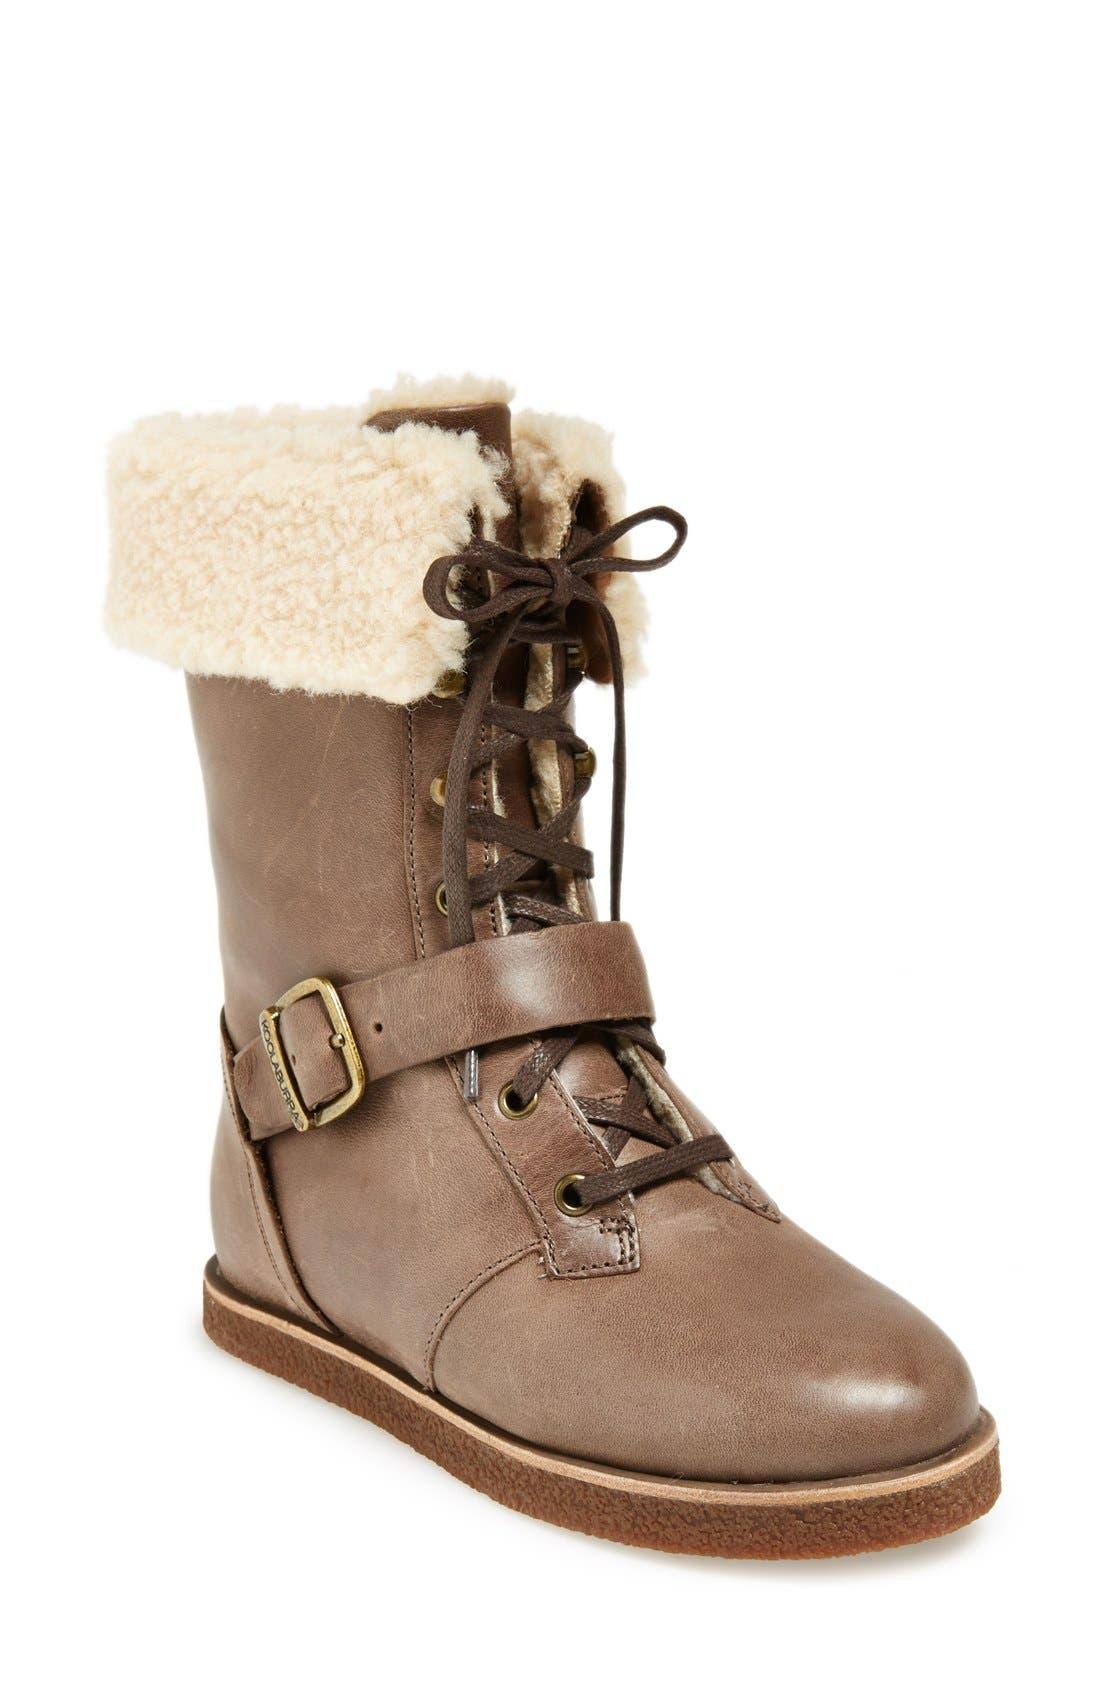 Alternate Image 1 Selected - Koolaburra 'Jovi' Lace-Up Moto Boot (Women)